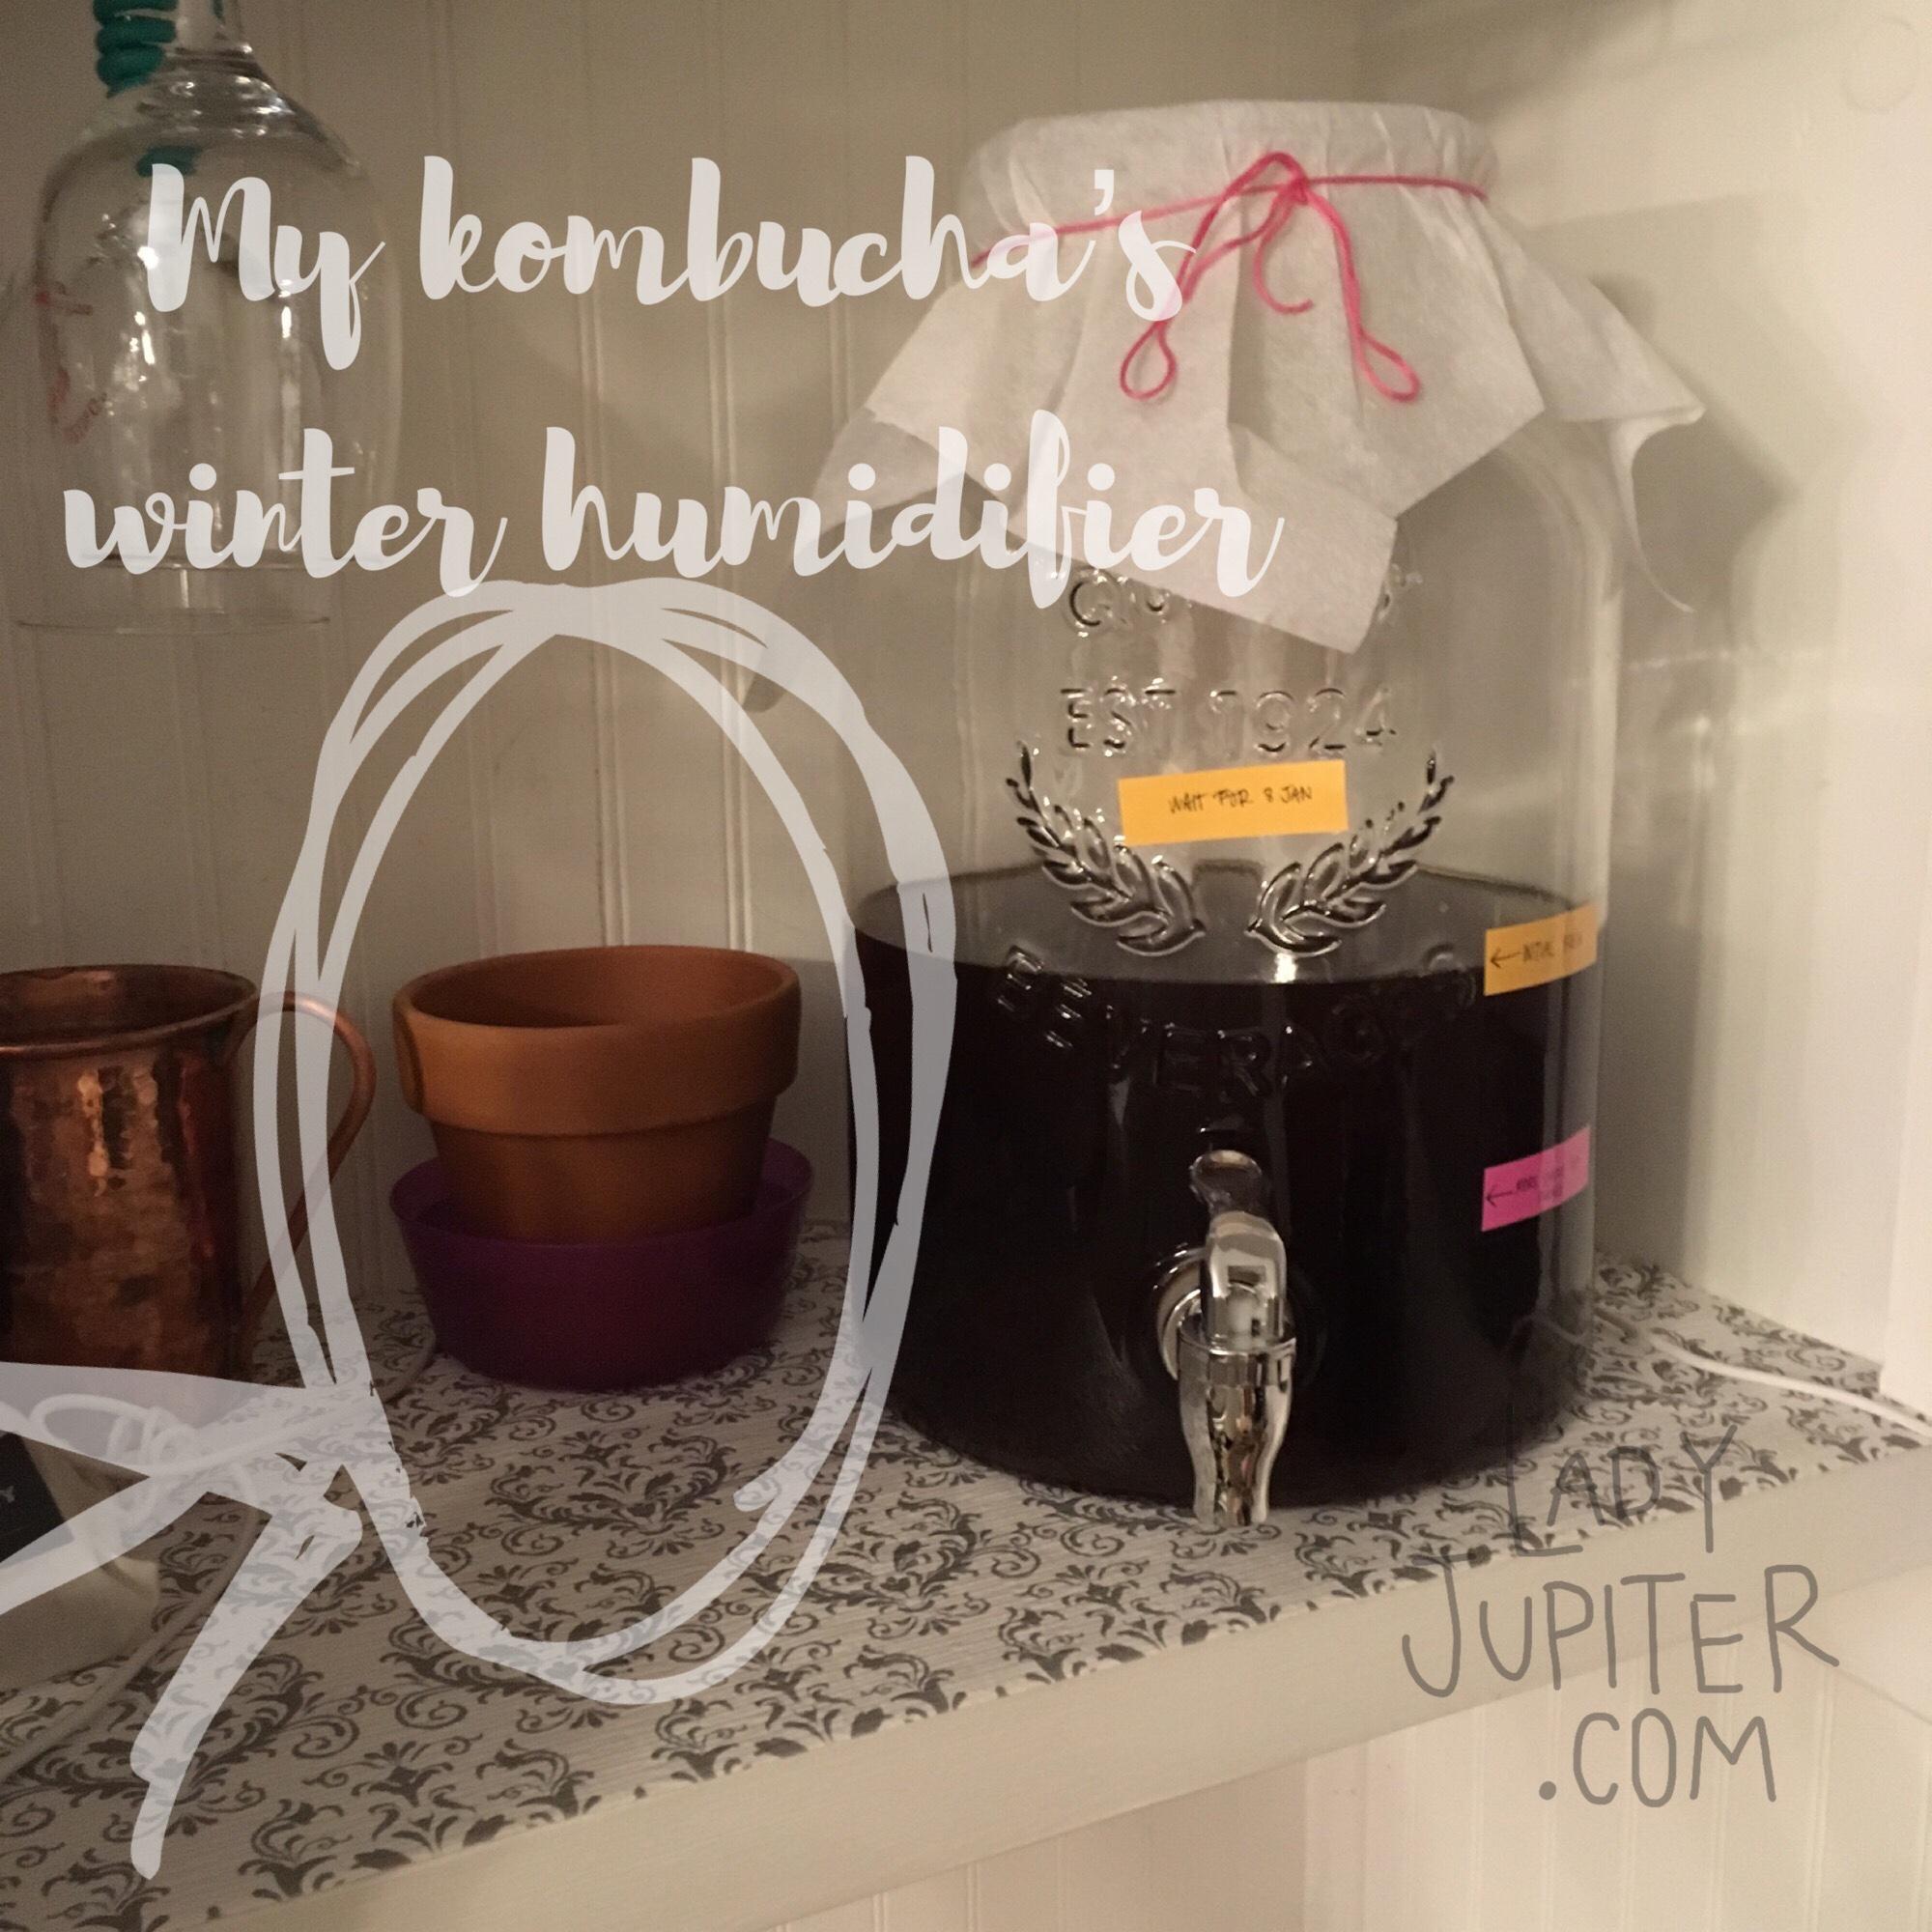 Lady Jupiter makes her first fermented tea #milblogger #kombucha